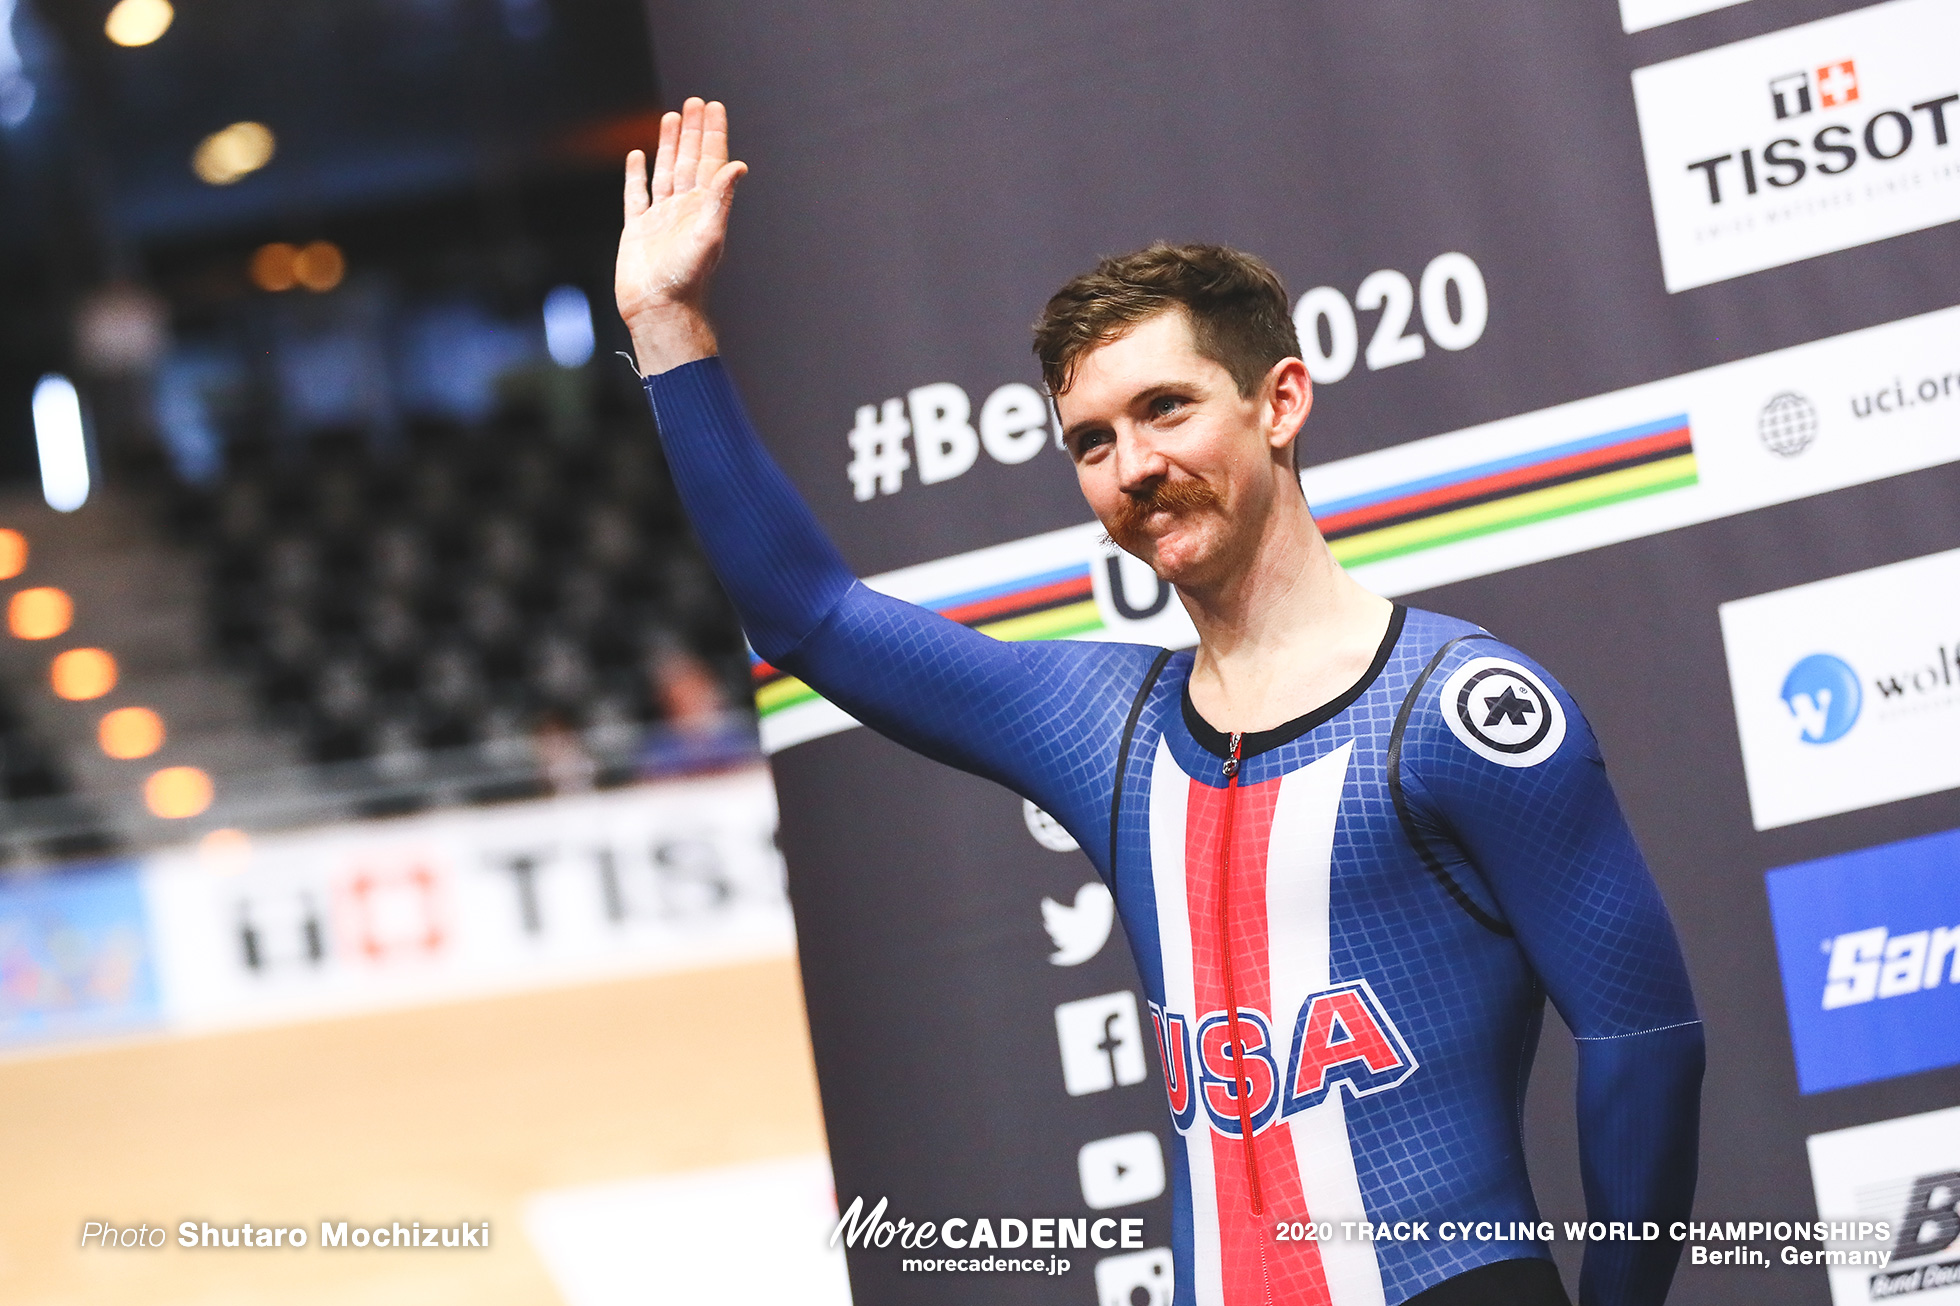 Ashton Lambie, Men's Individual Pursuit / 2020 Track Cycling World Championships, アシュトン・ランビー